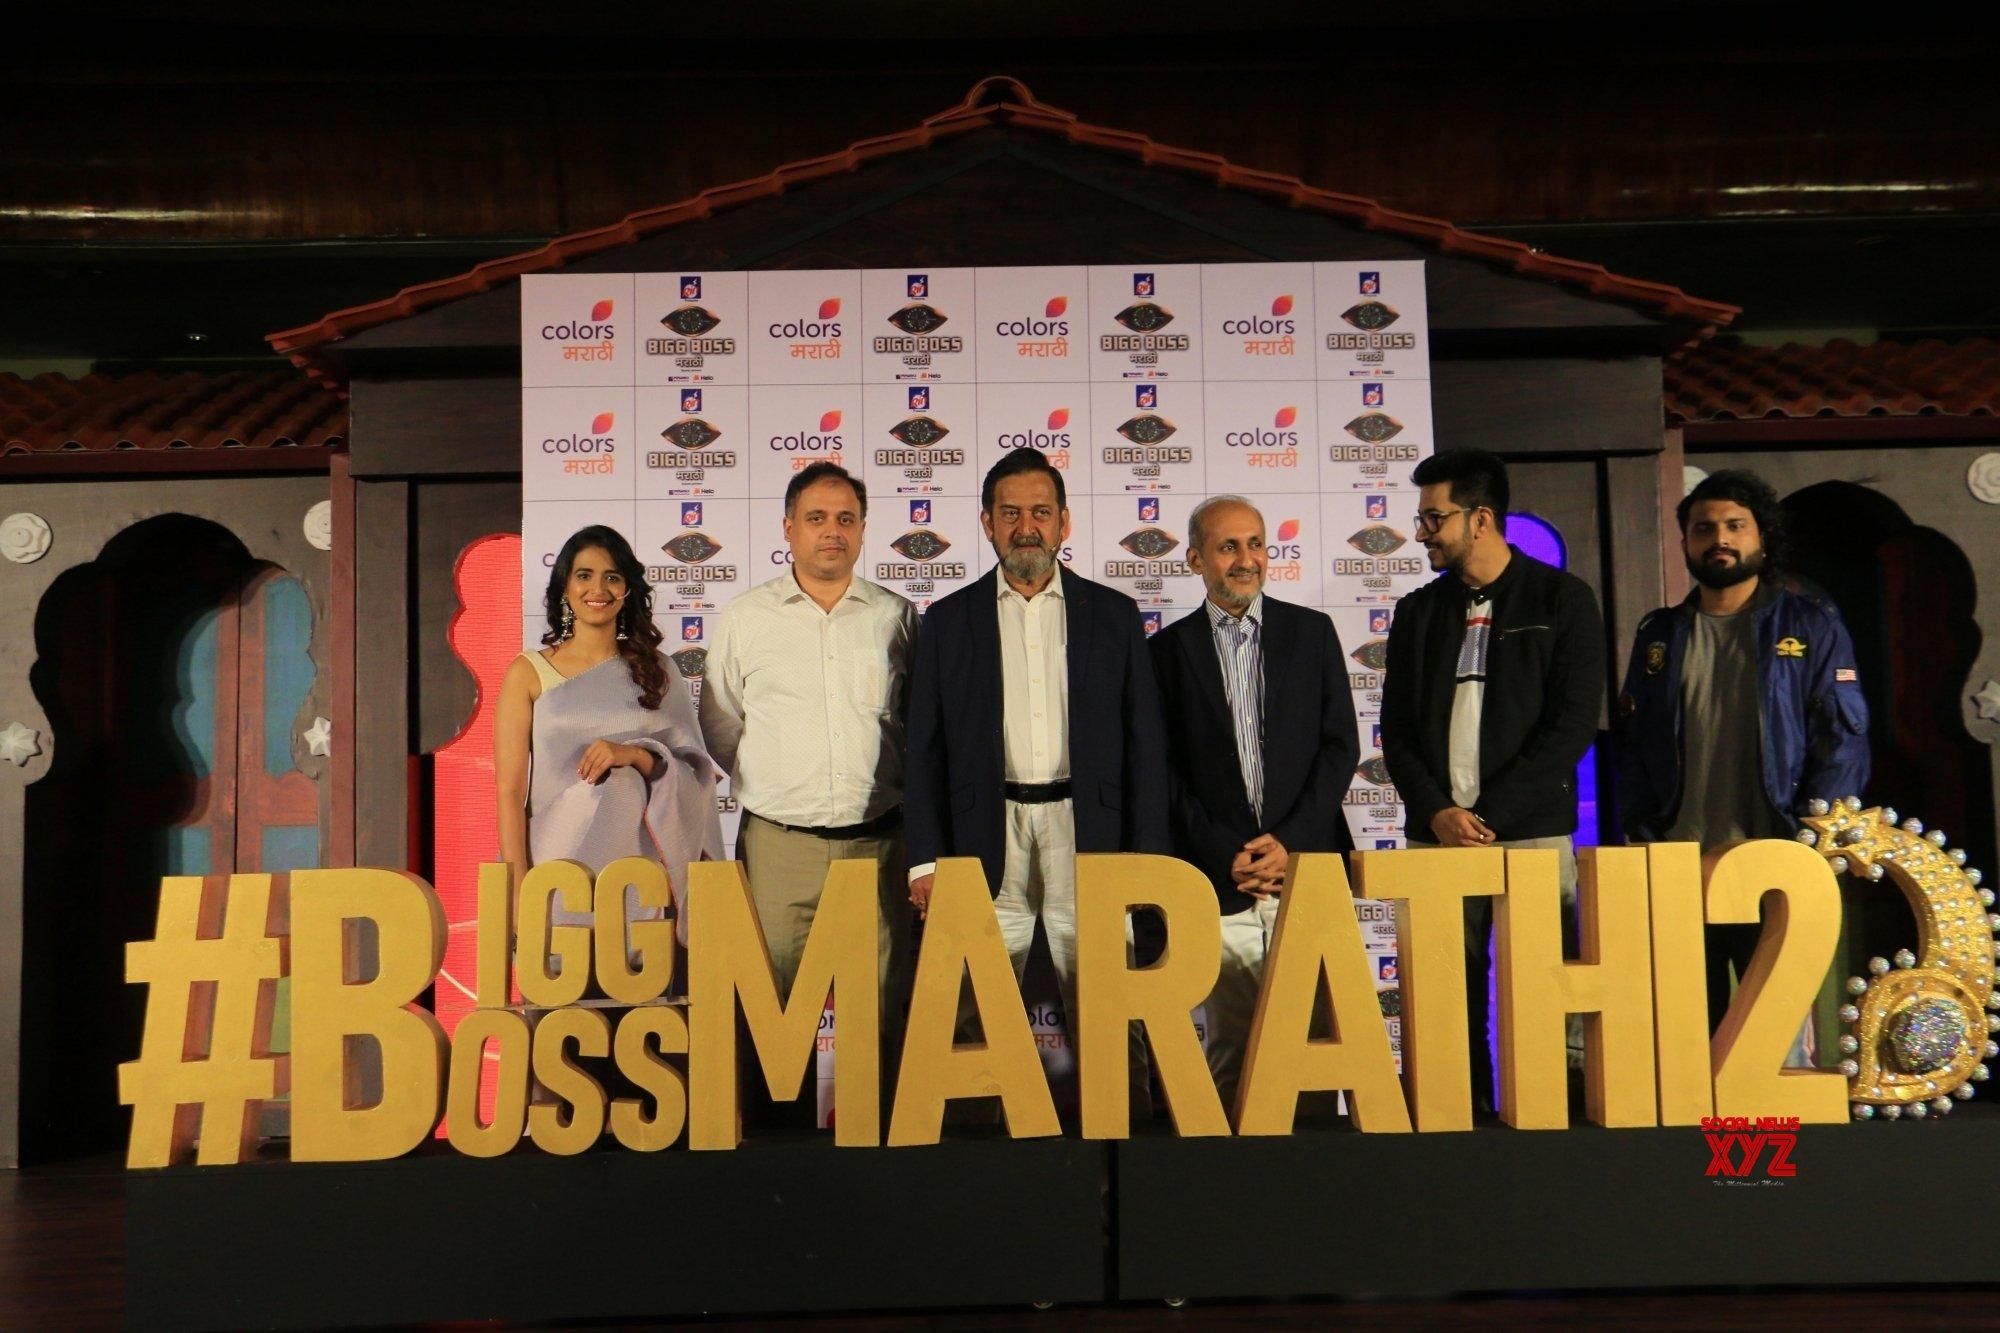 Mumbai: Big Boss Marathi Season 2 - Press Conference #Gallery